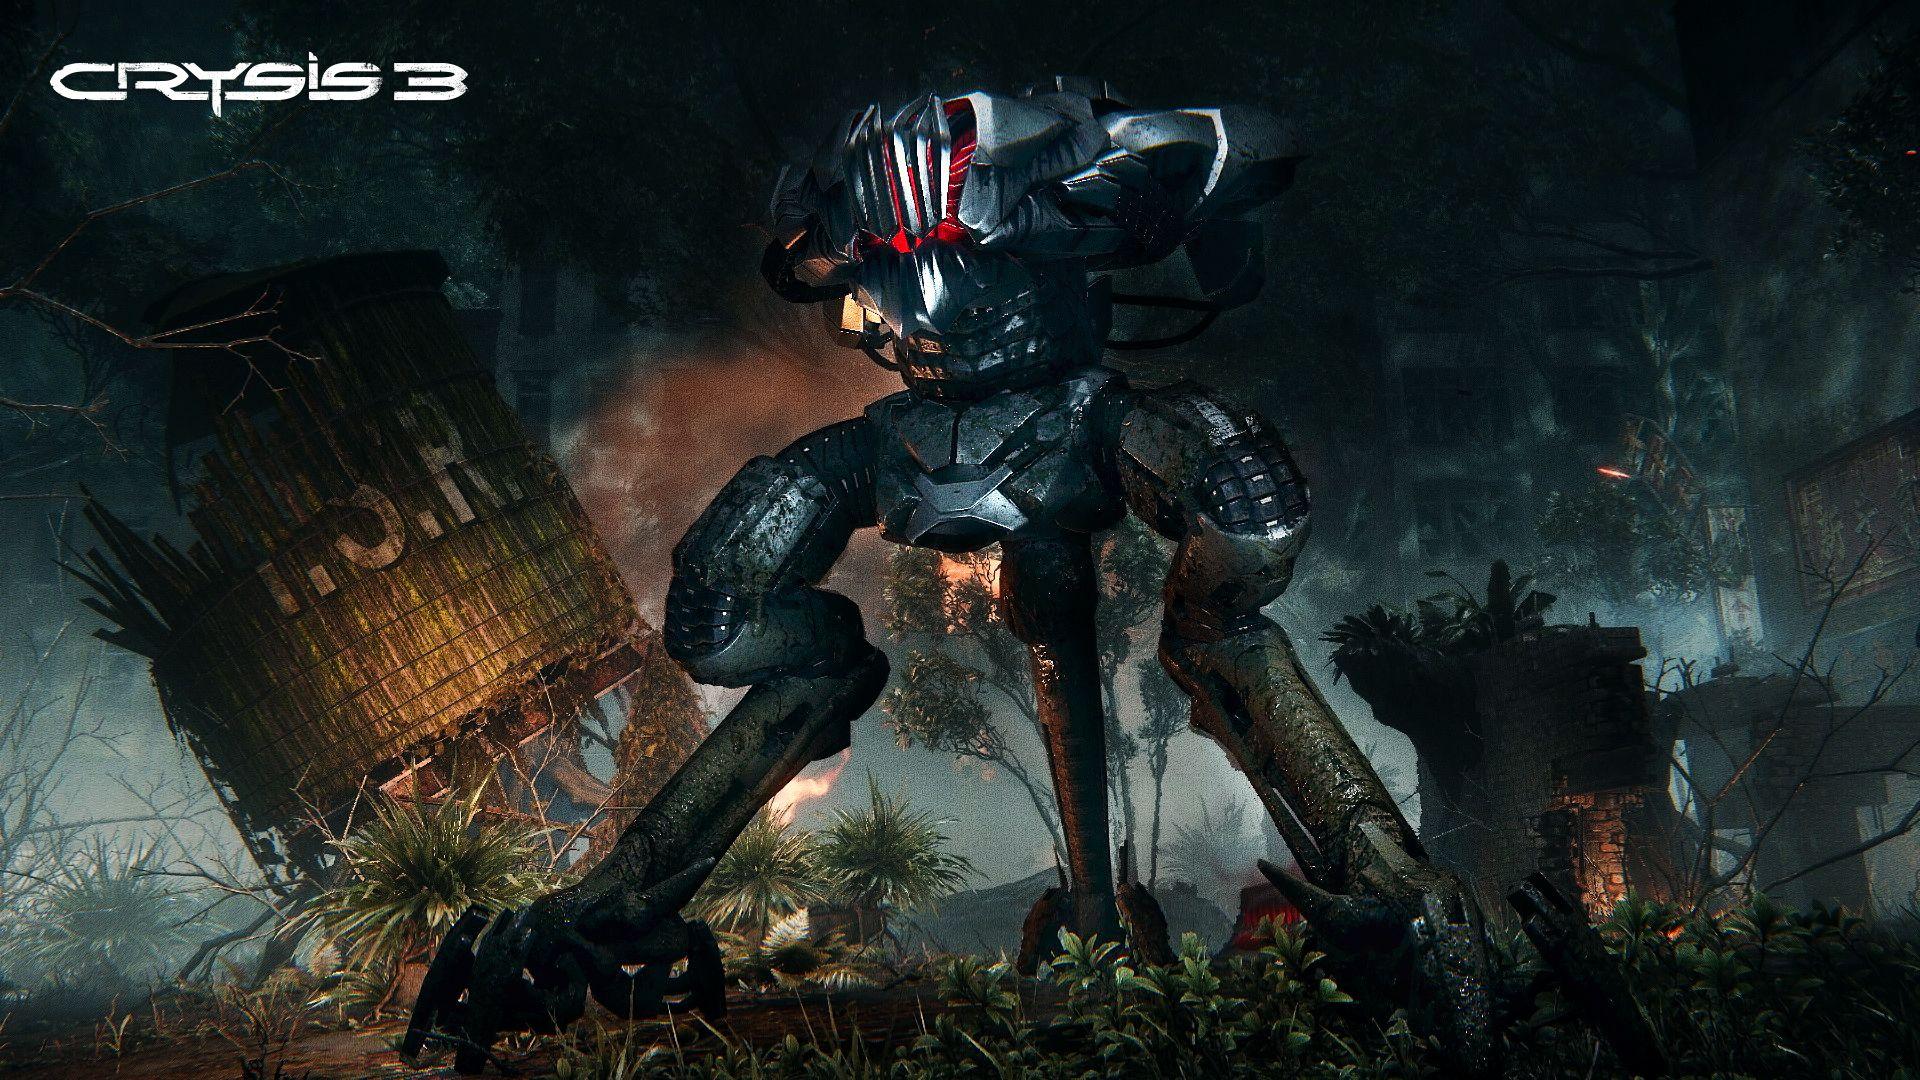 Dojmy z multiplayerové bety Crysis 3 74365